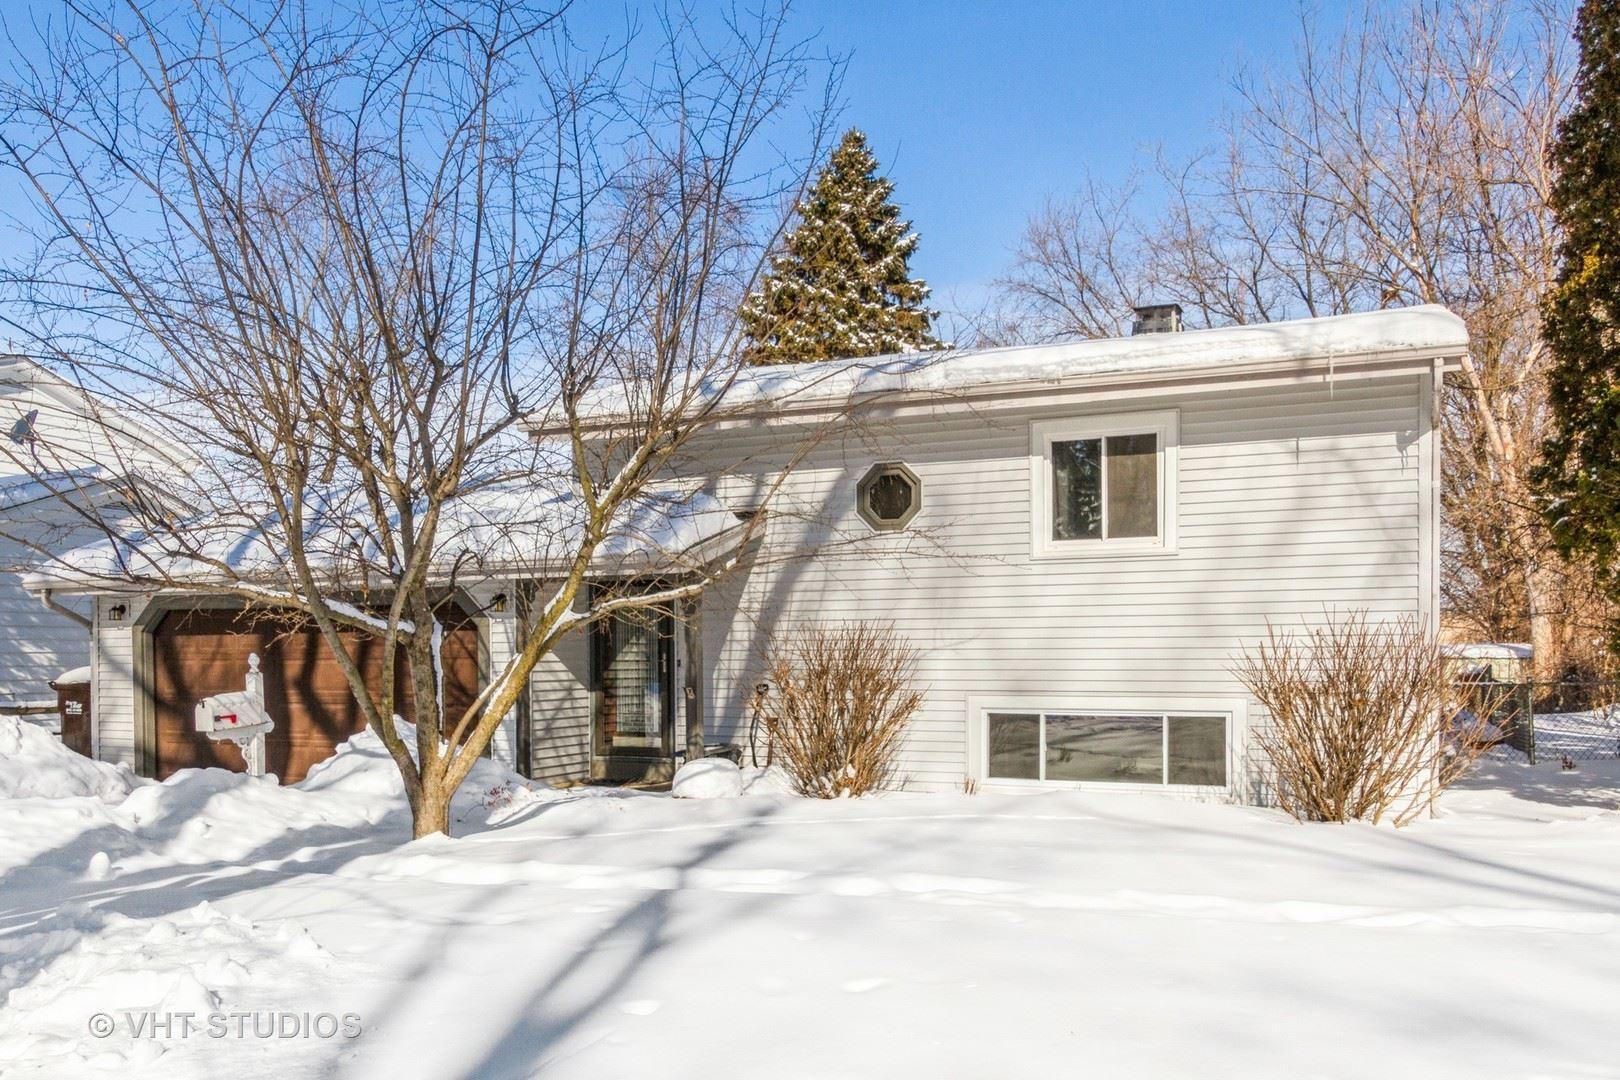 316 Maplewood Lane, Crystal Lake, IL 60014 - #: 10990954